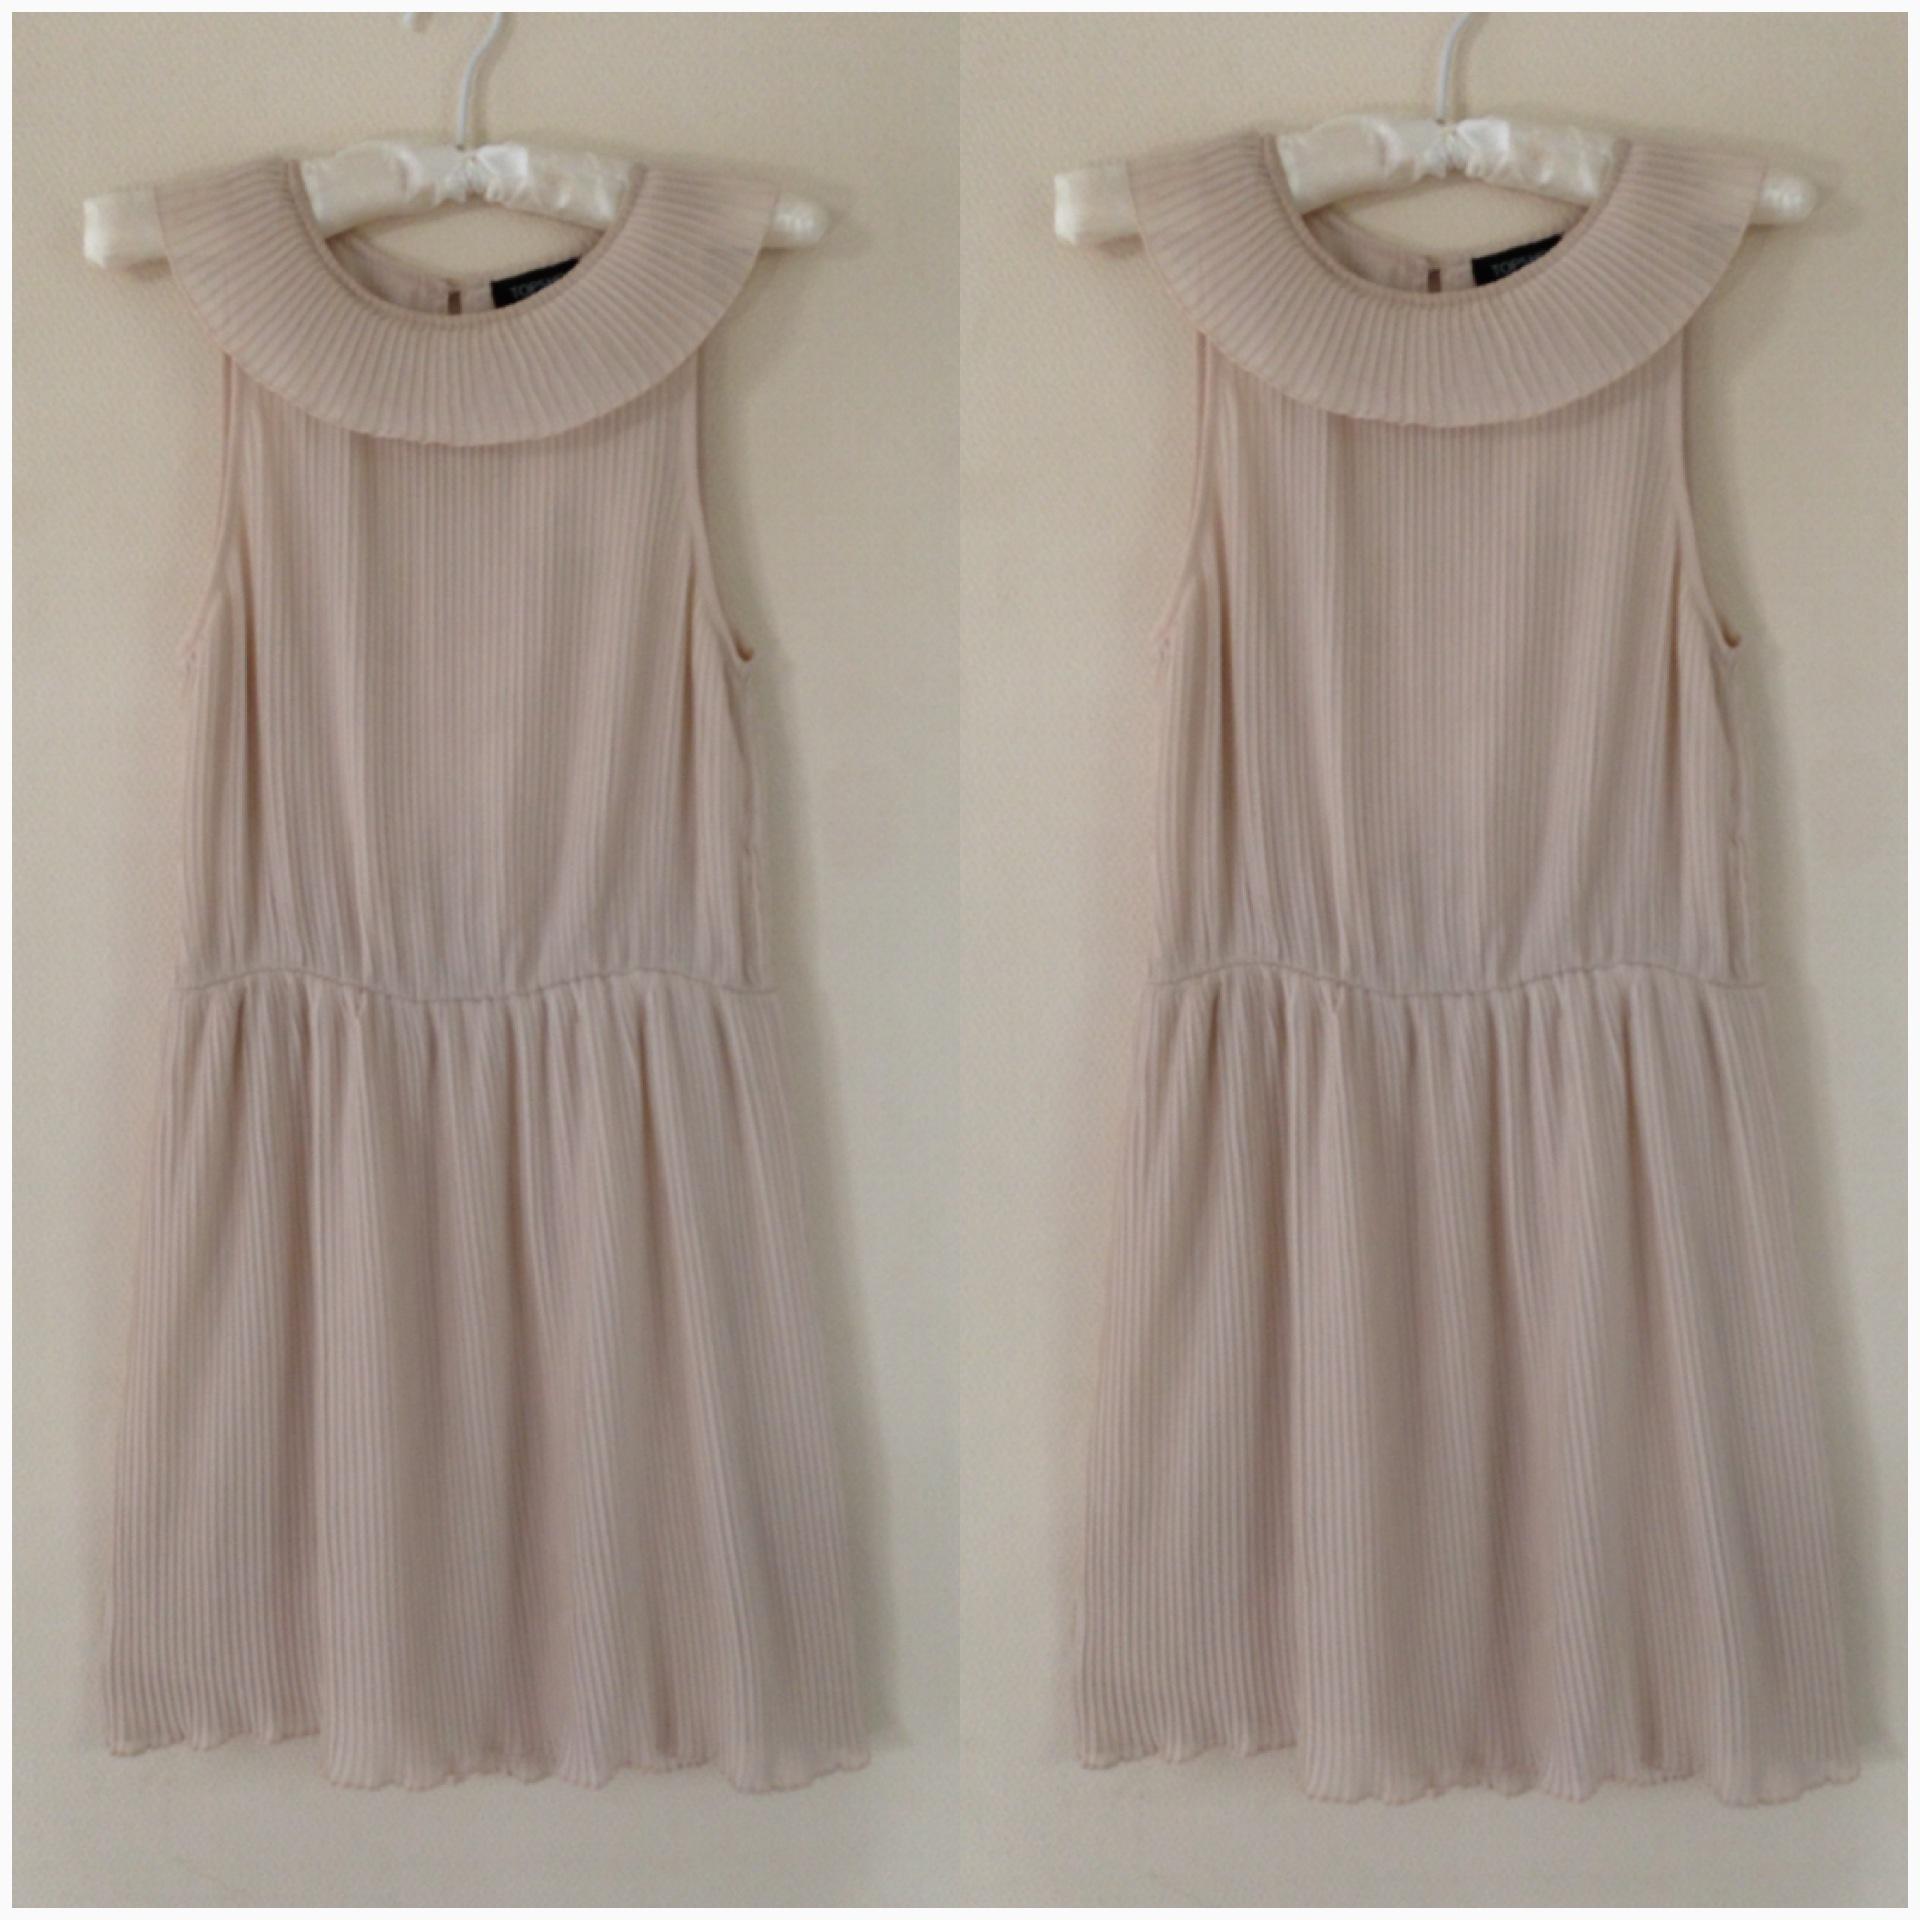 Topshop Grecian style Light Pink/Peach Dress